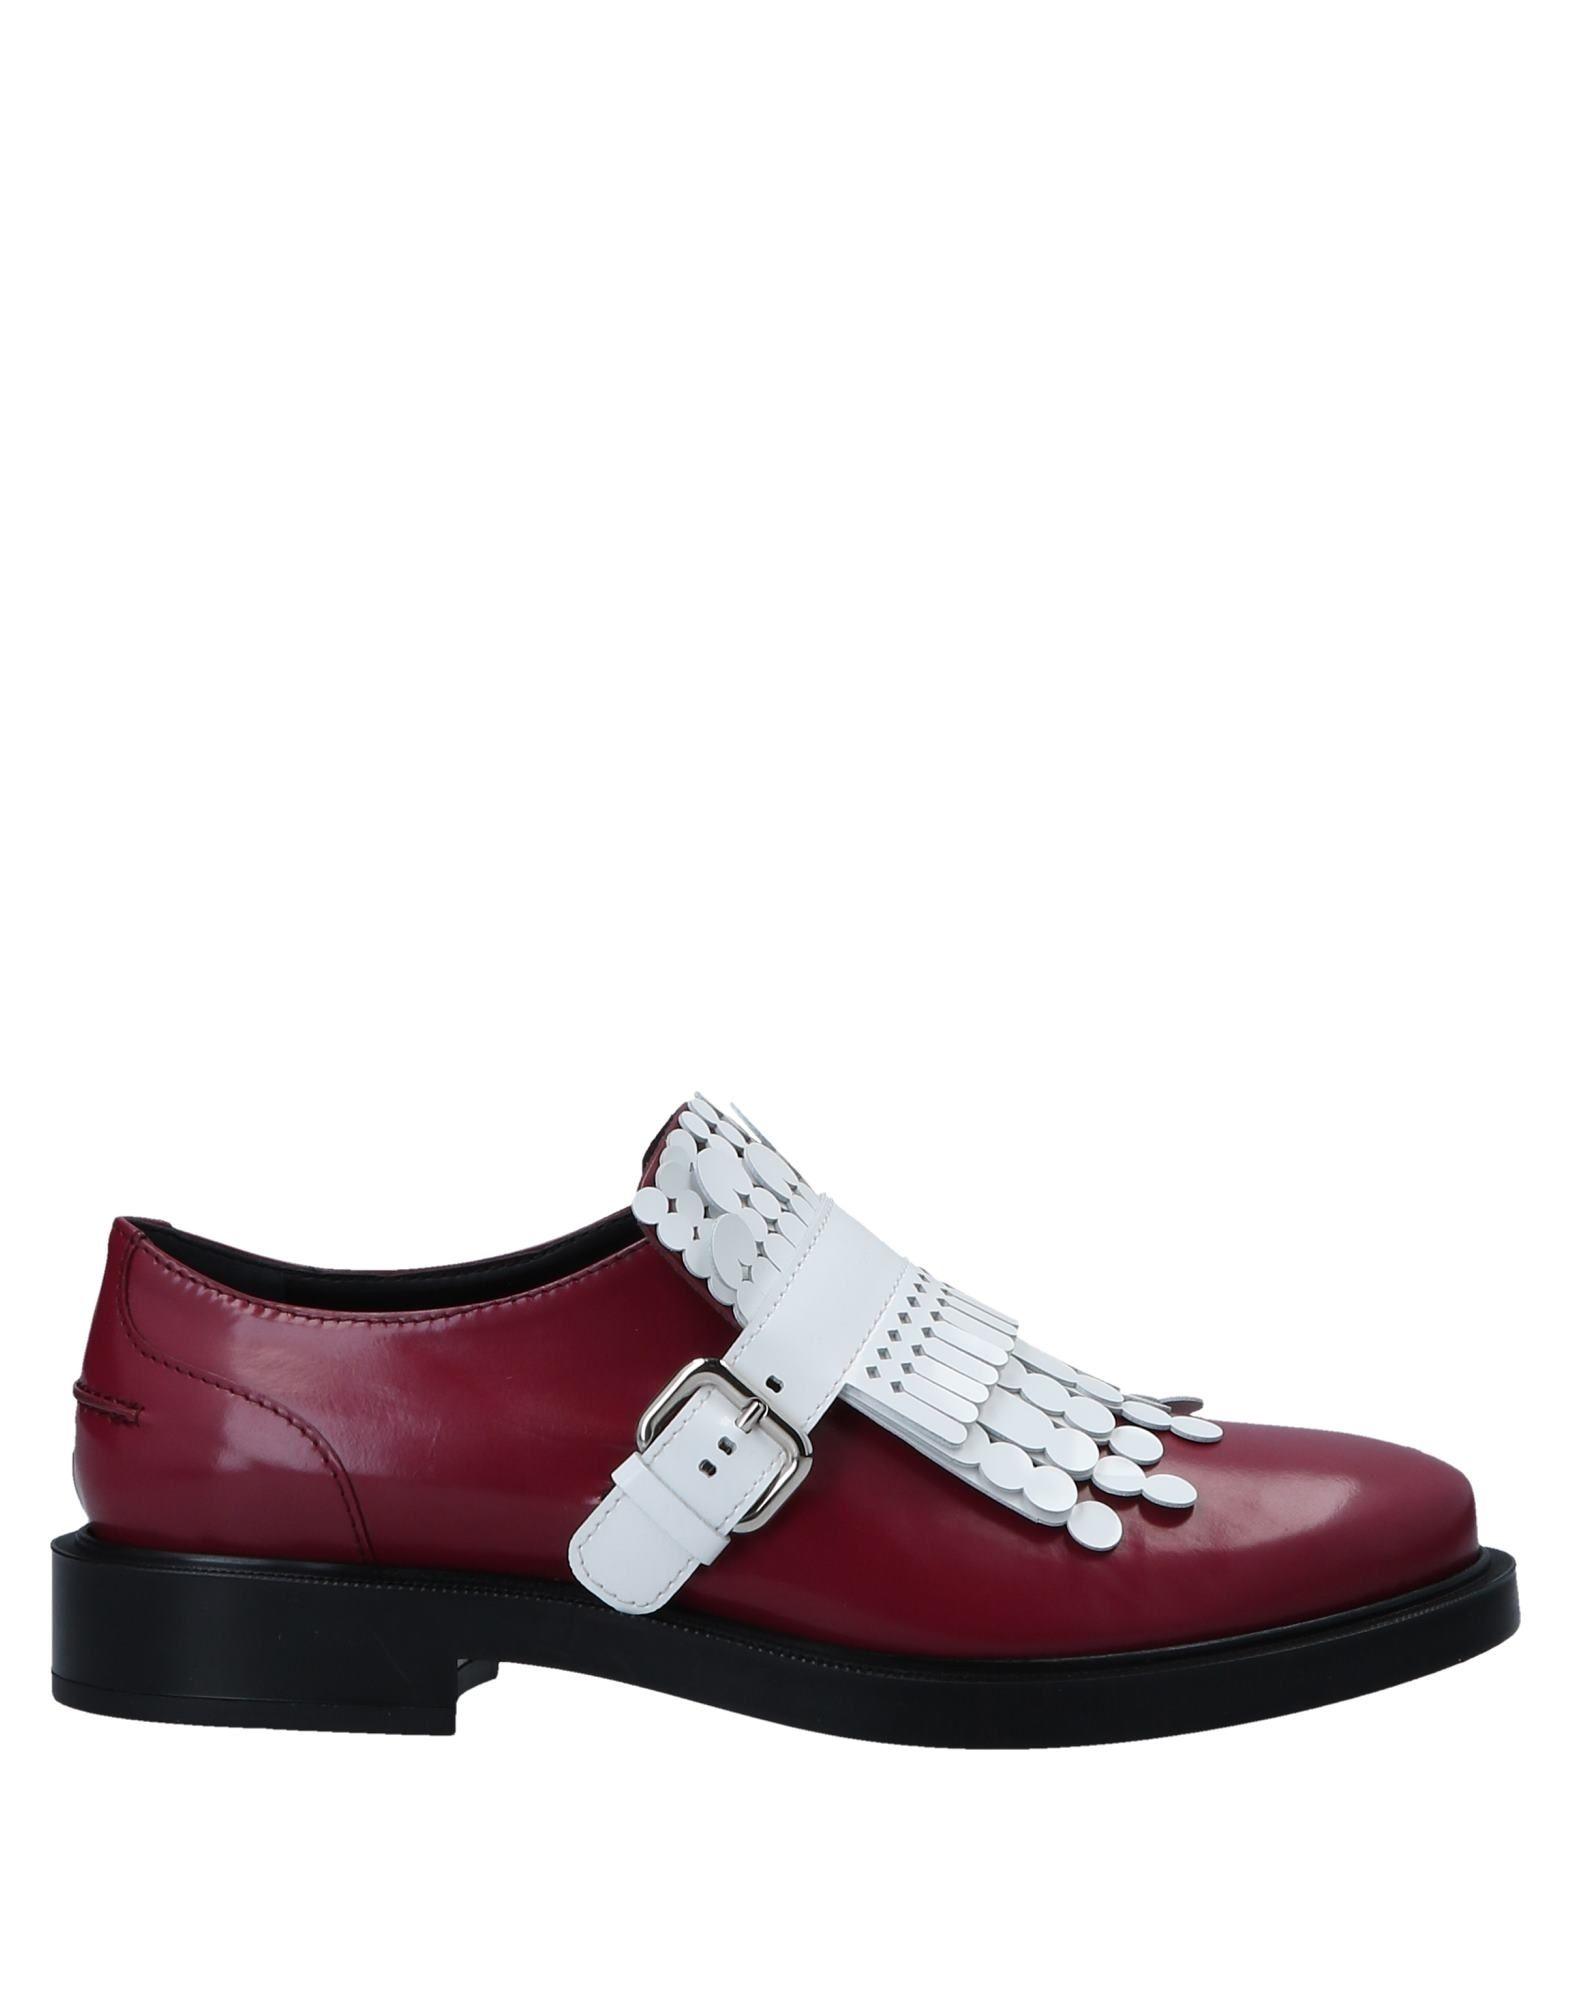 Mocassino Tod's Donna - 11557989PO elegante